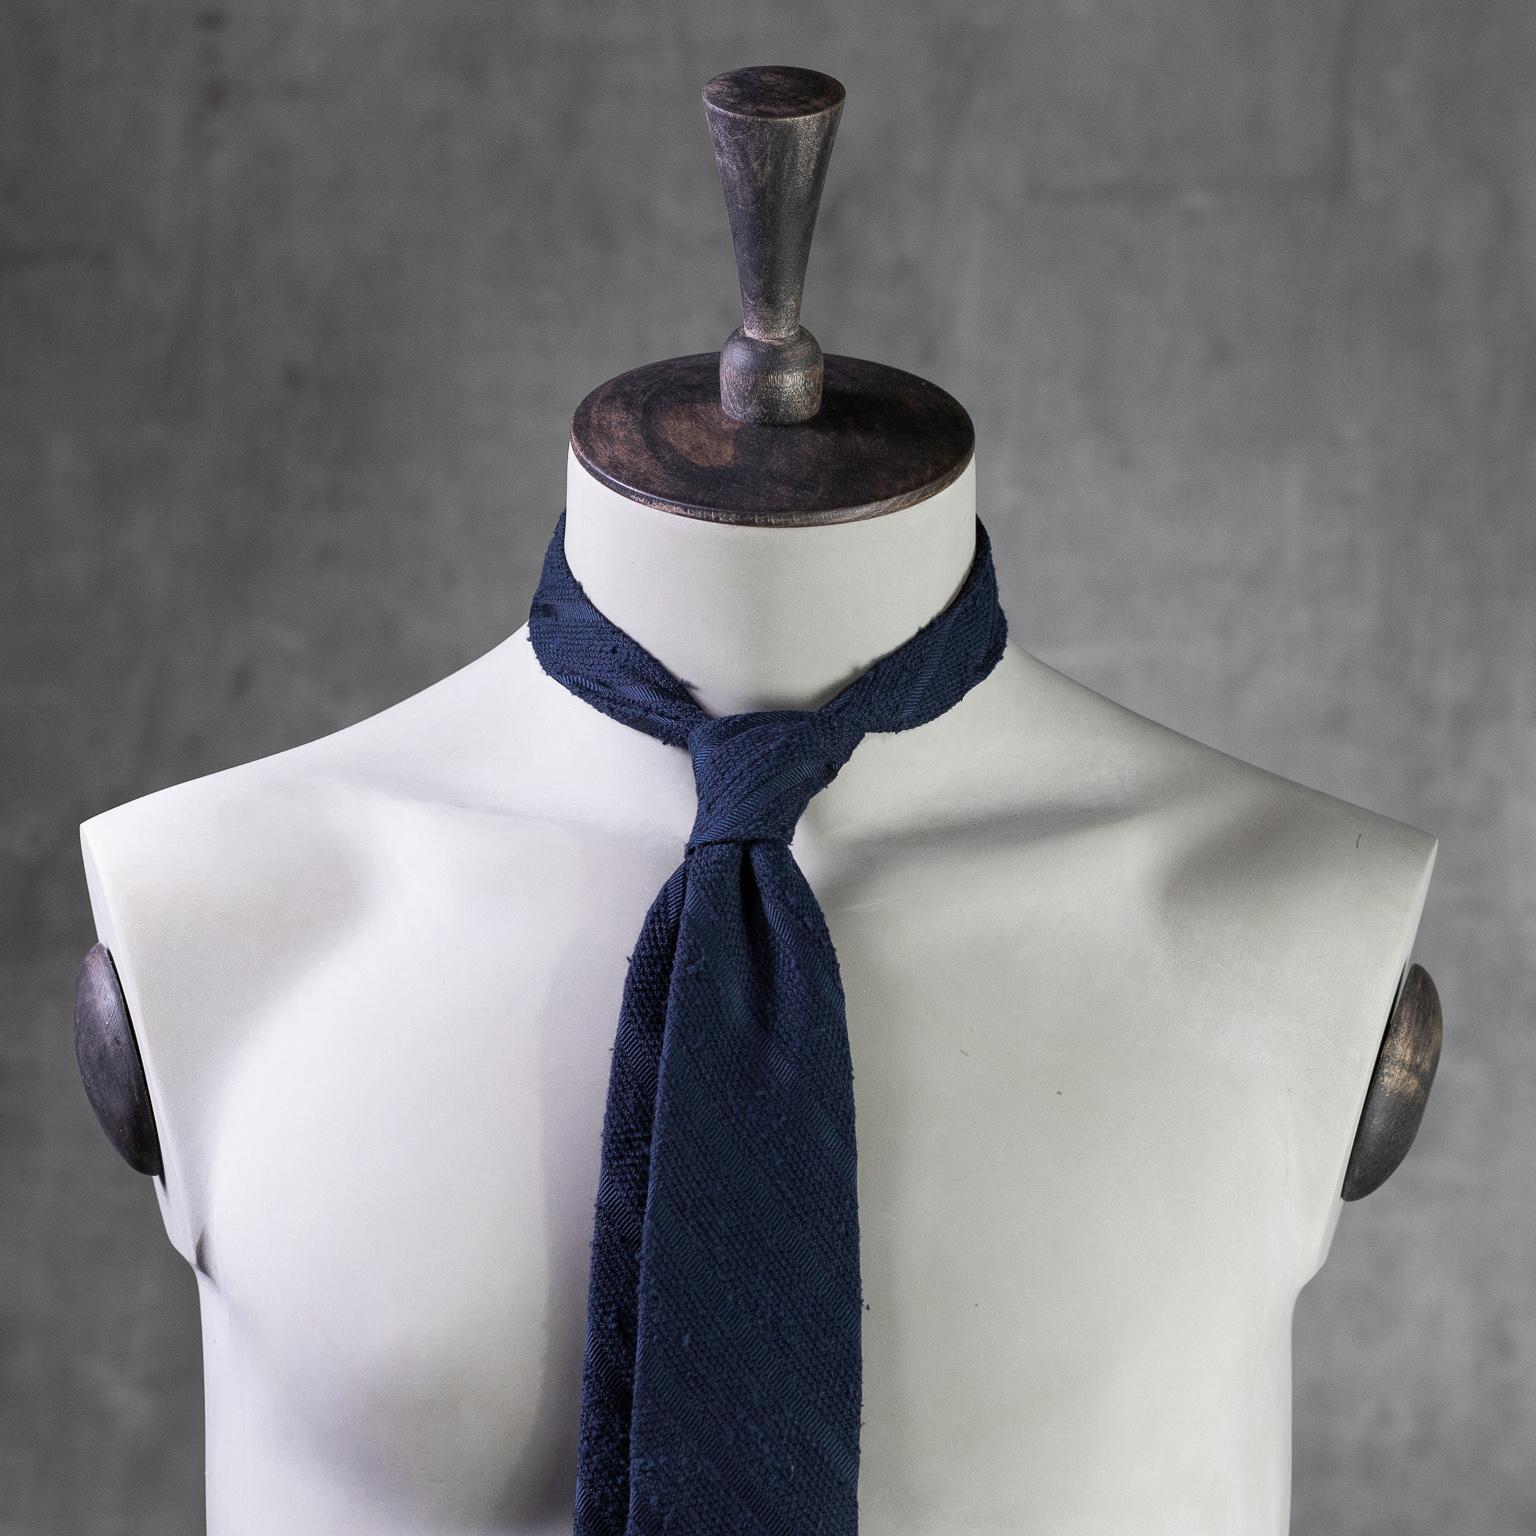 SHANTUNG-0358-Tie-Initials-Corbata-Iniciales-The-Seelk-3